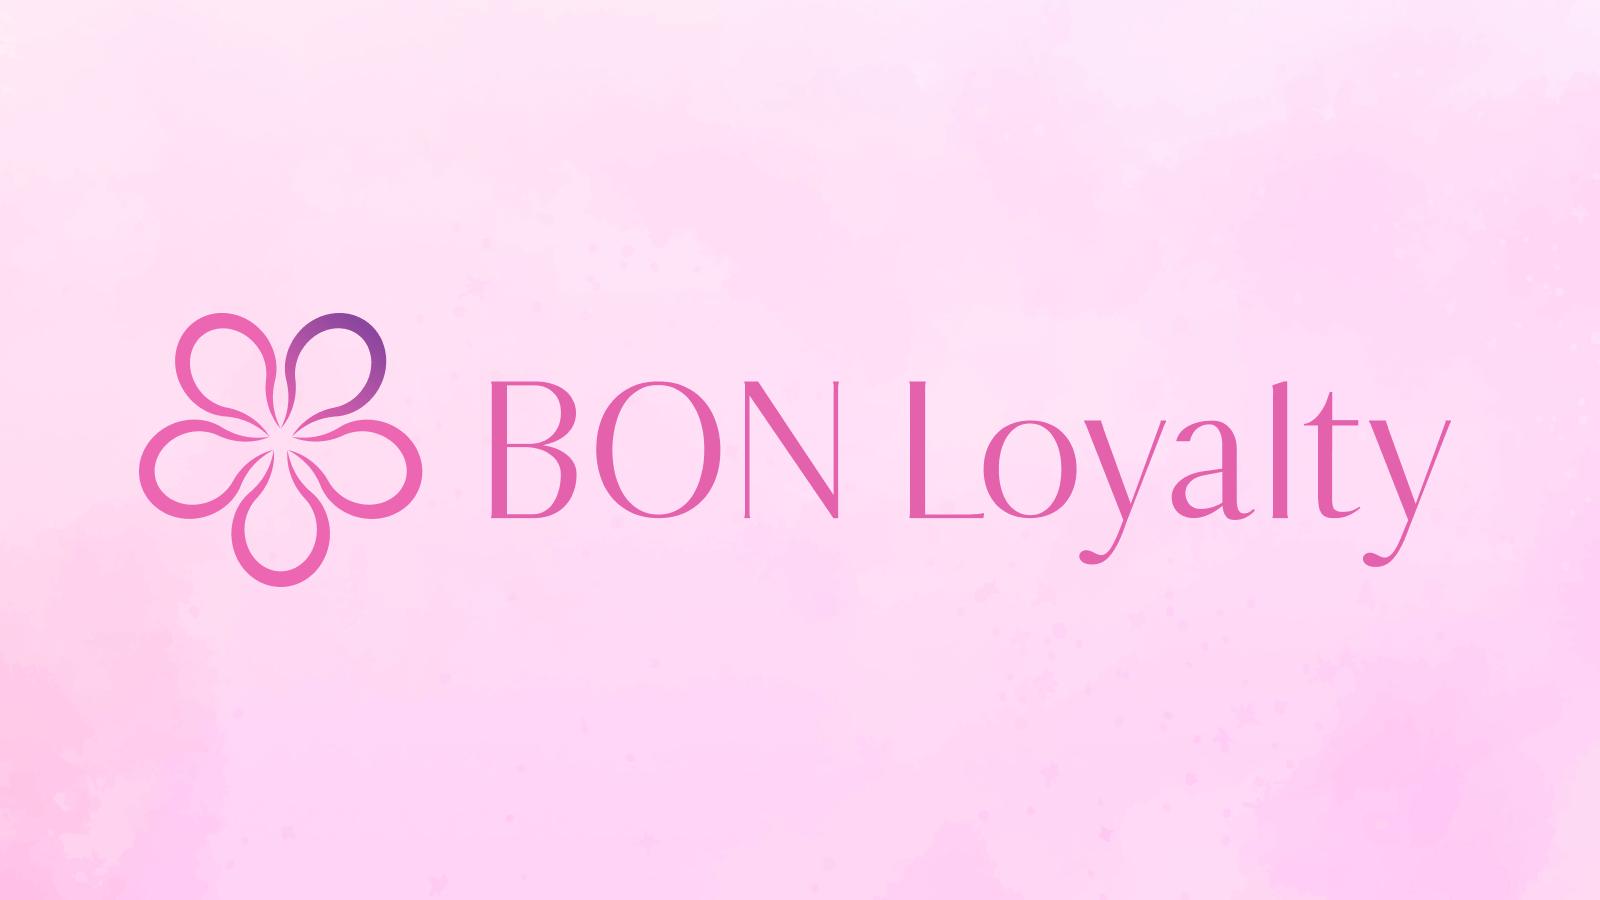 BON Loyalty introduction